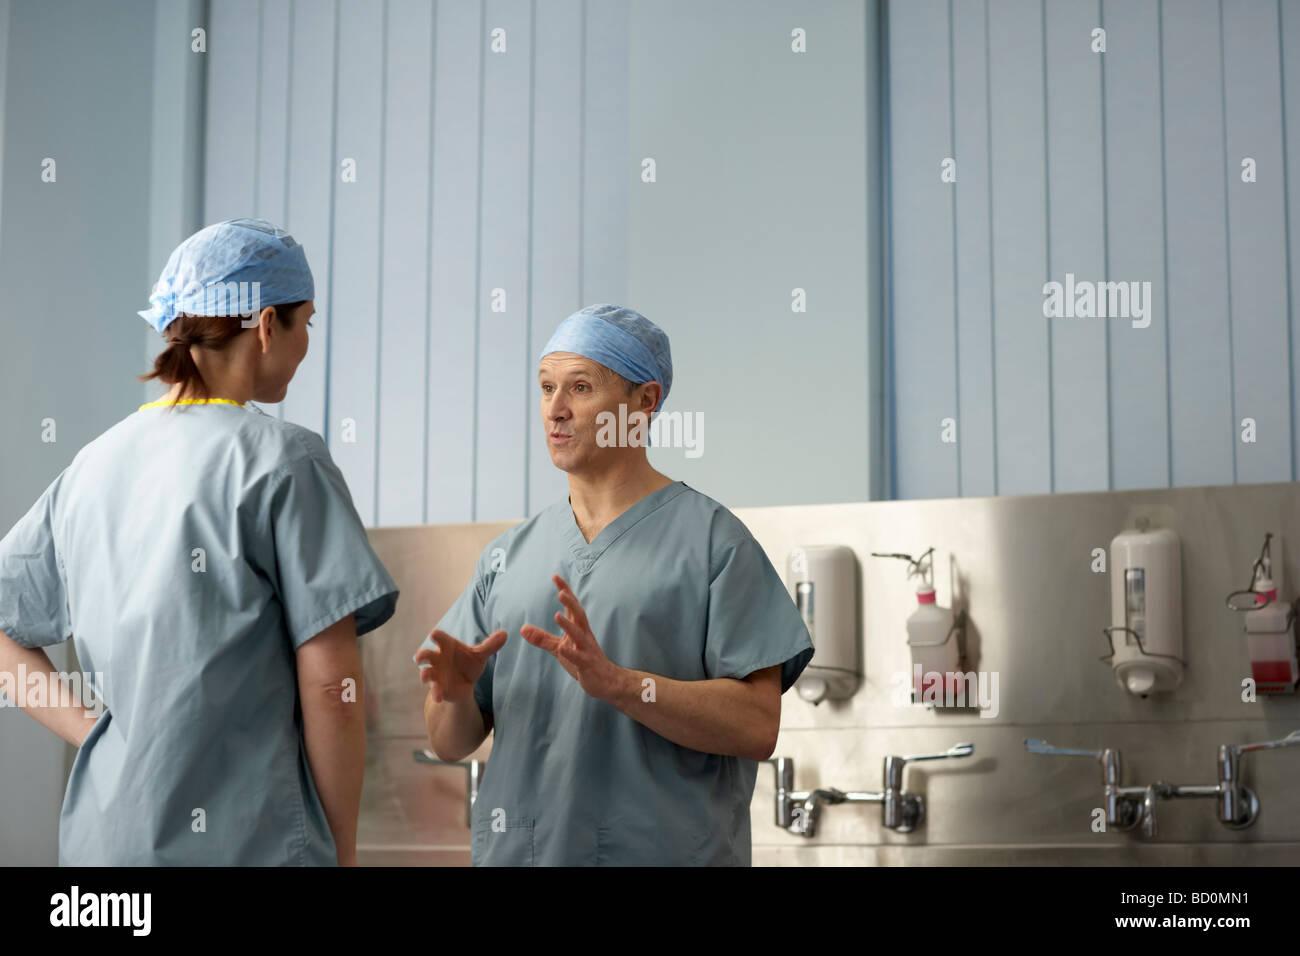 Medizinisches Personal in Scrubs in Diskussion Stockbild